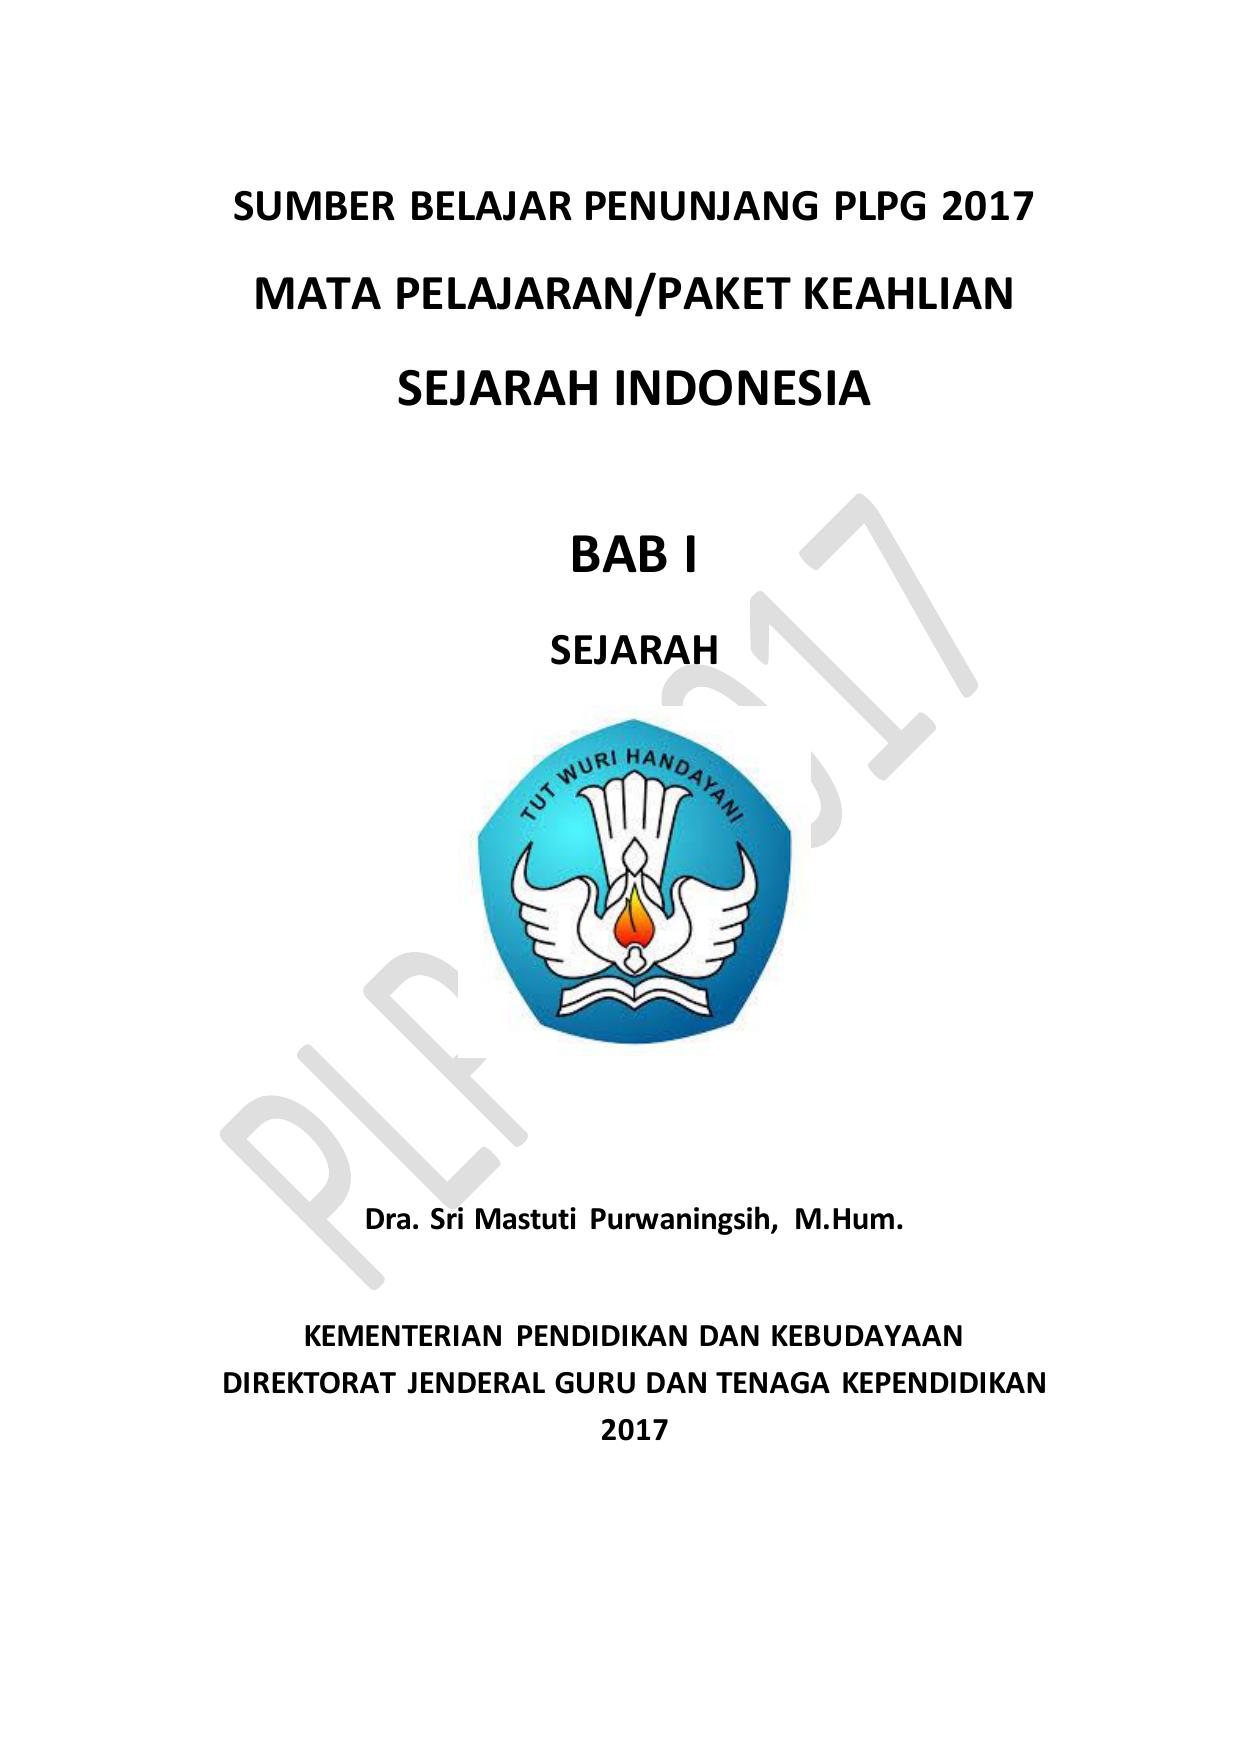 SUMBER BELAJAR PENUNJANG PLPG 2017 MATA PELAJARAN PAKET KEAHLIAN SEJARAH INDONESIA BAB I SEJARAH Dra Sri Mastuti Purwaningsih M Hum